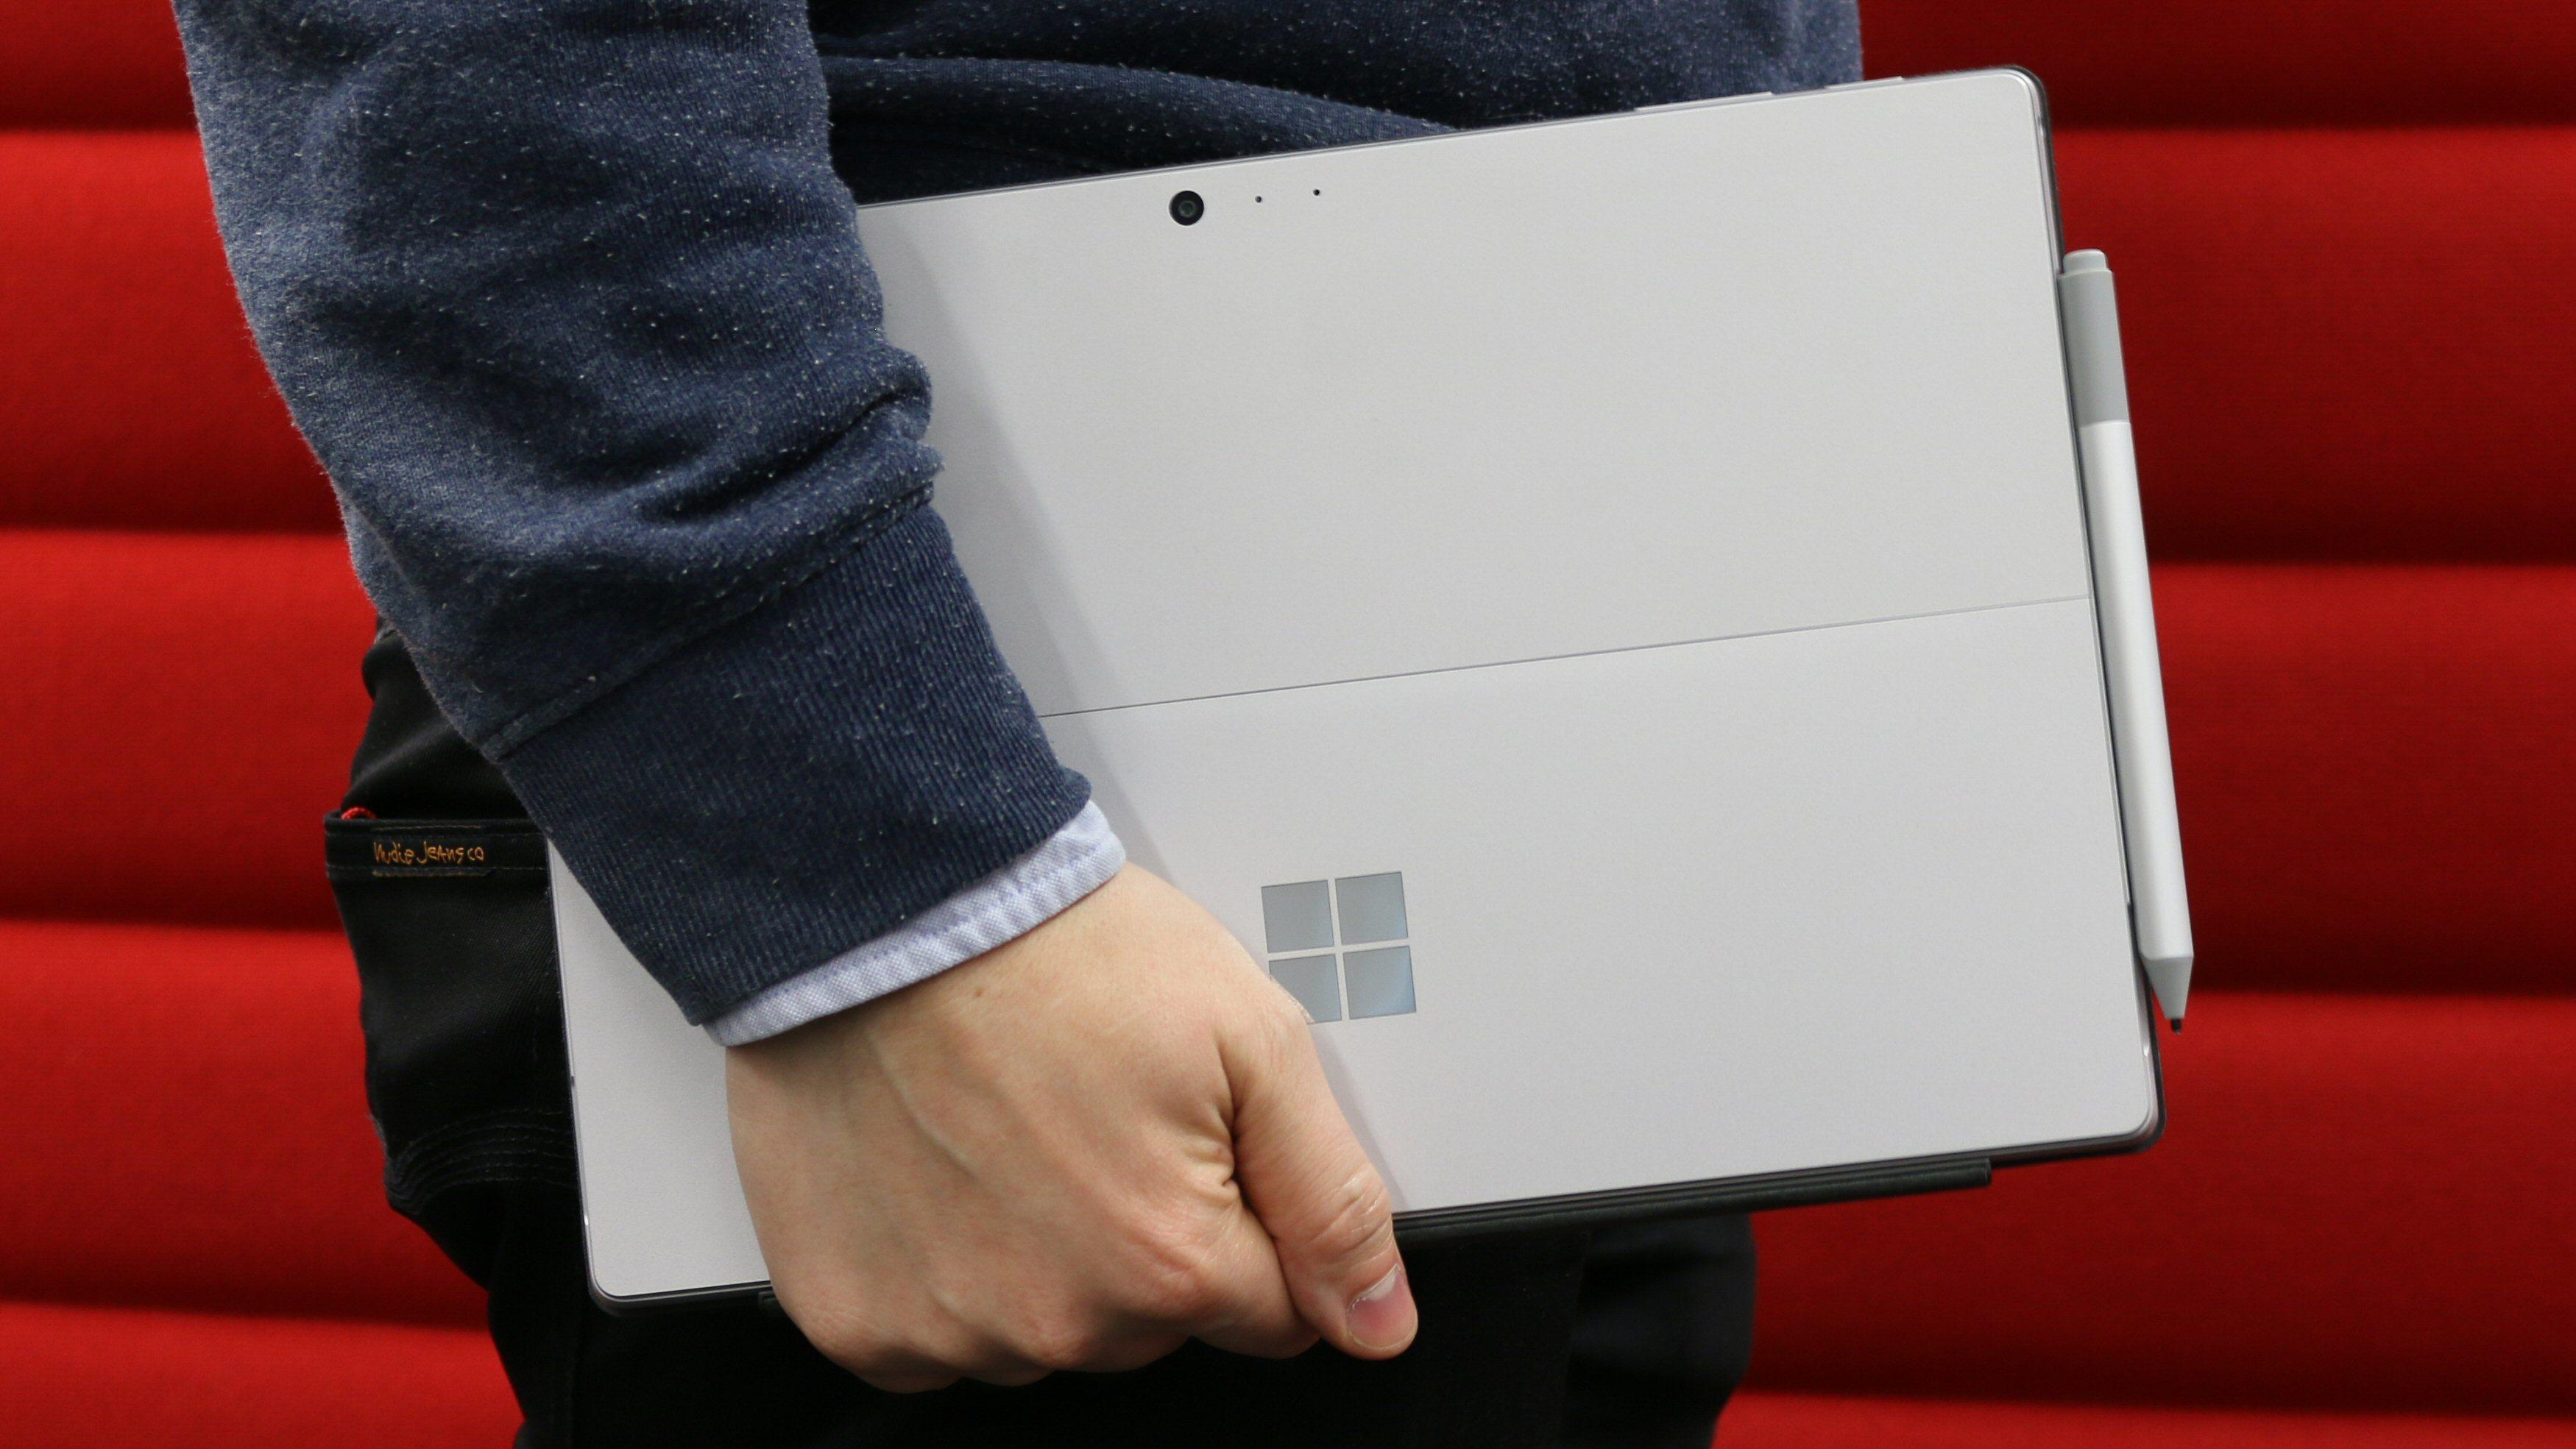 Nye Microsoft Surface Pro med LTE Advanced